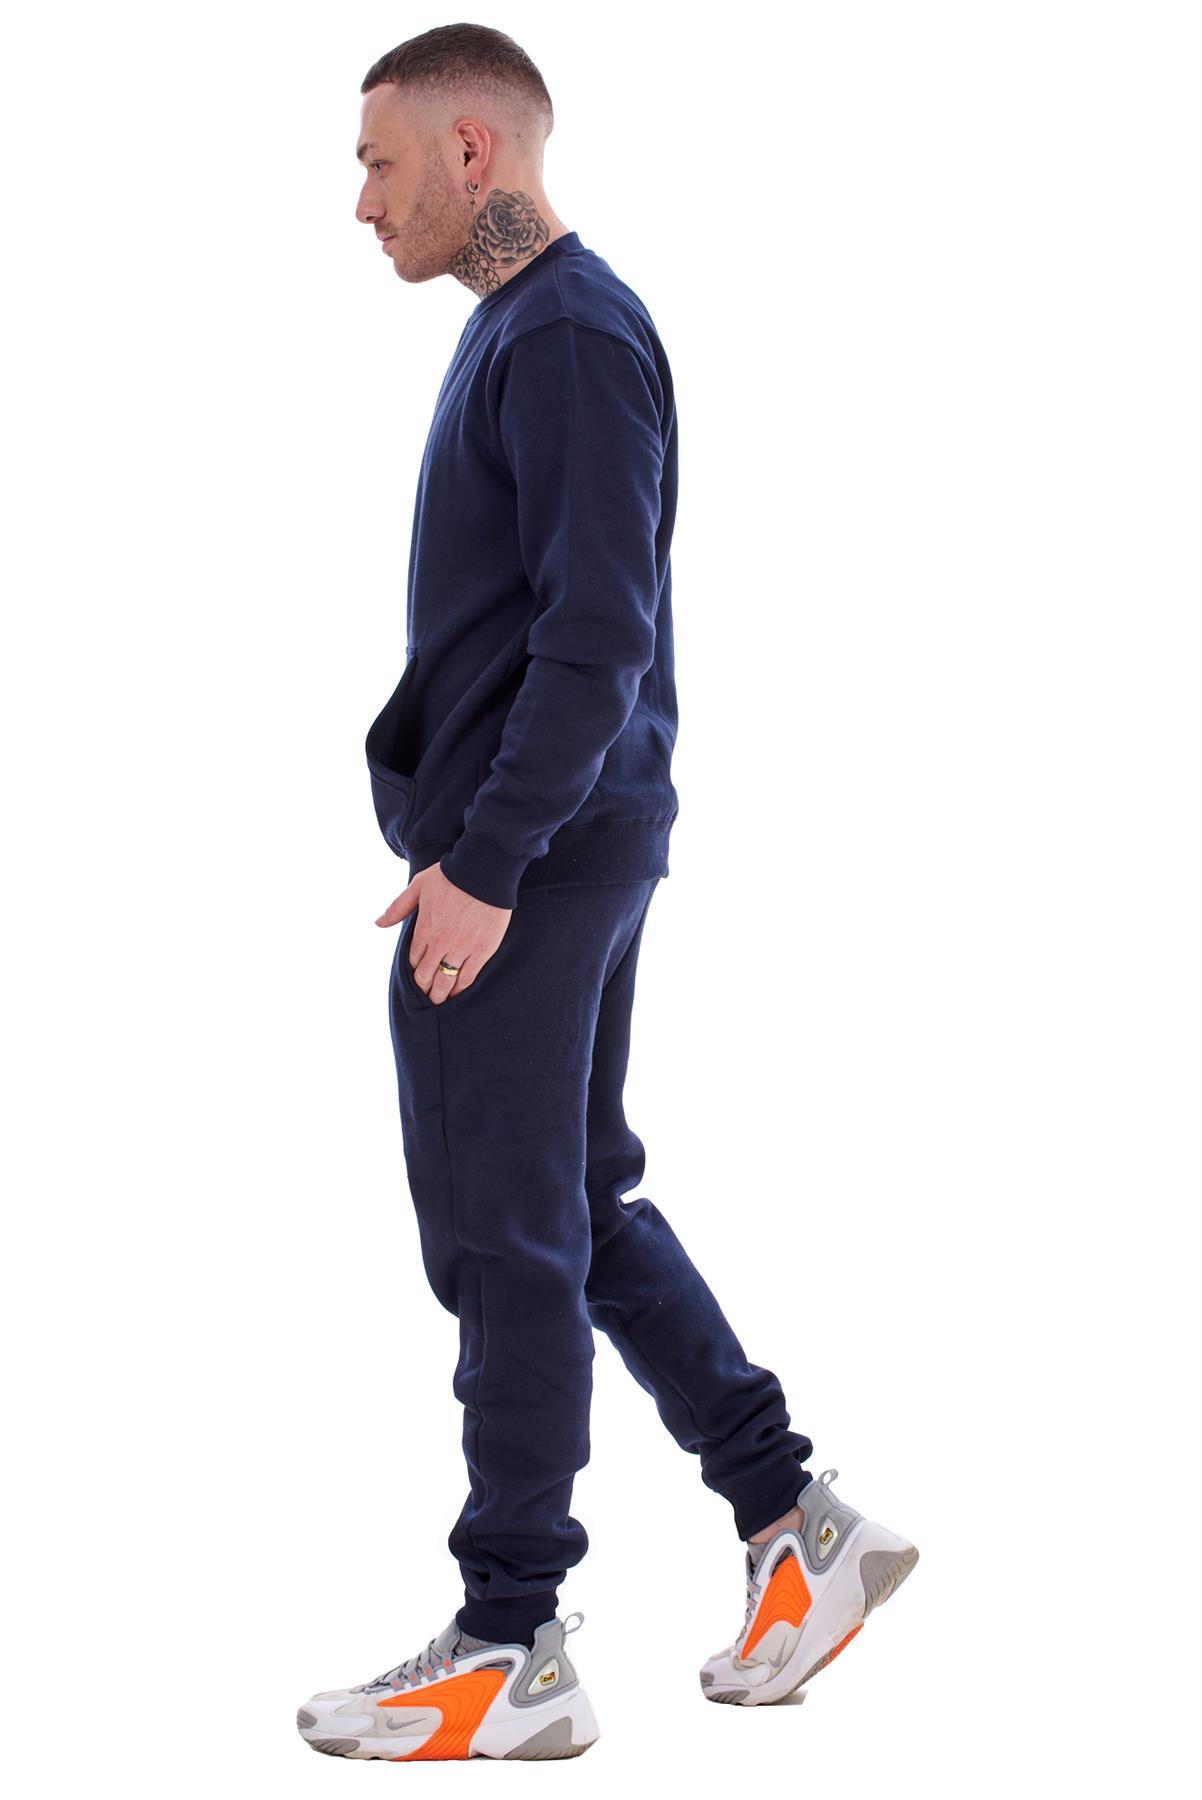 Mens-Plain-Tracksuit-Branded-Fleece-Pullover-Sweatshirts-Cotton-Jogging-Bottoms thumbnail 13